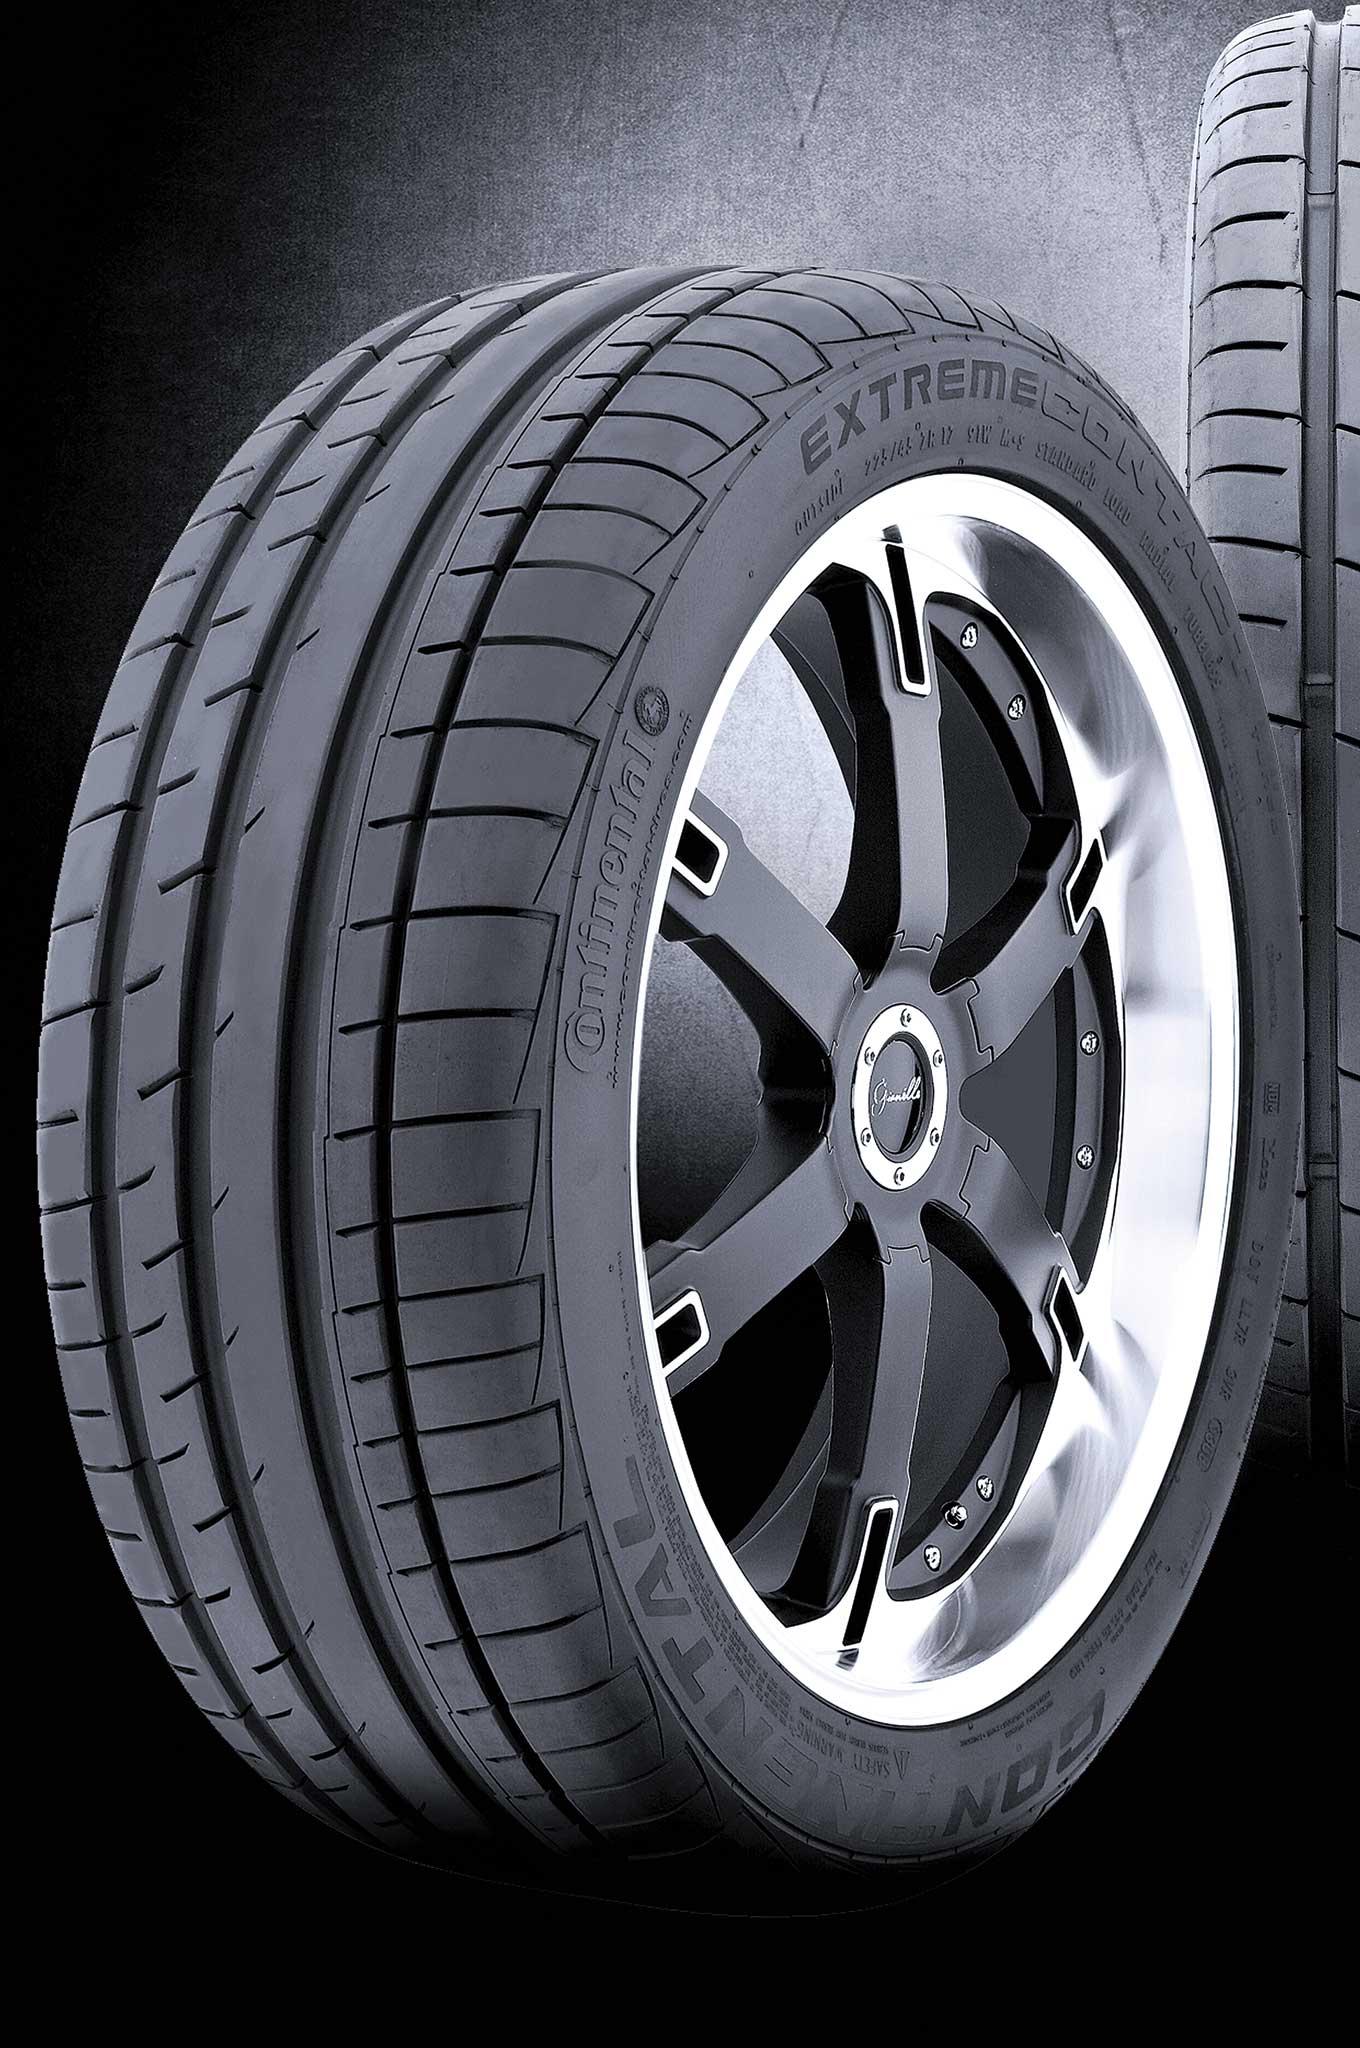 continental tires premium passenger tires extremecontact dw 004